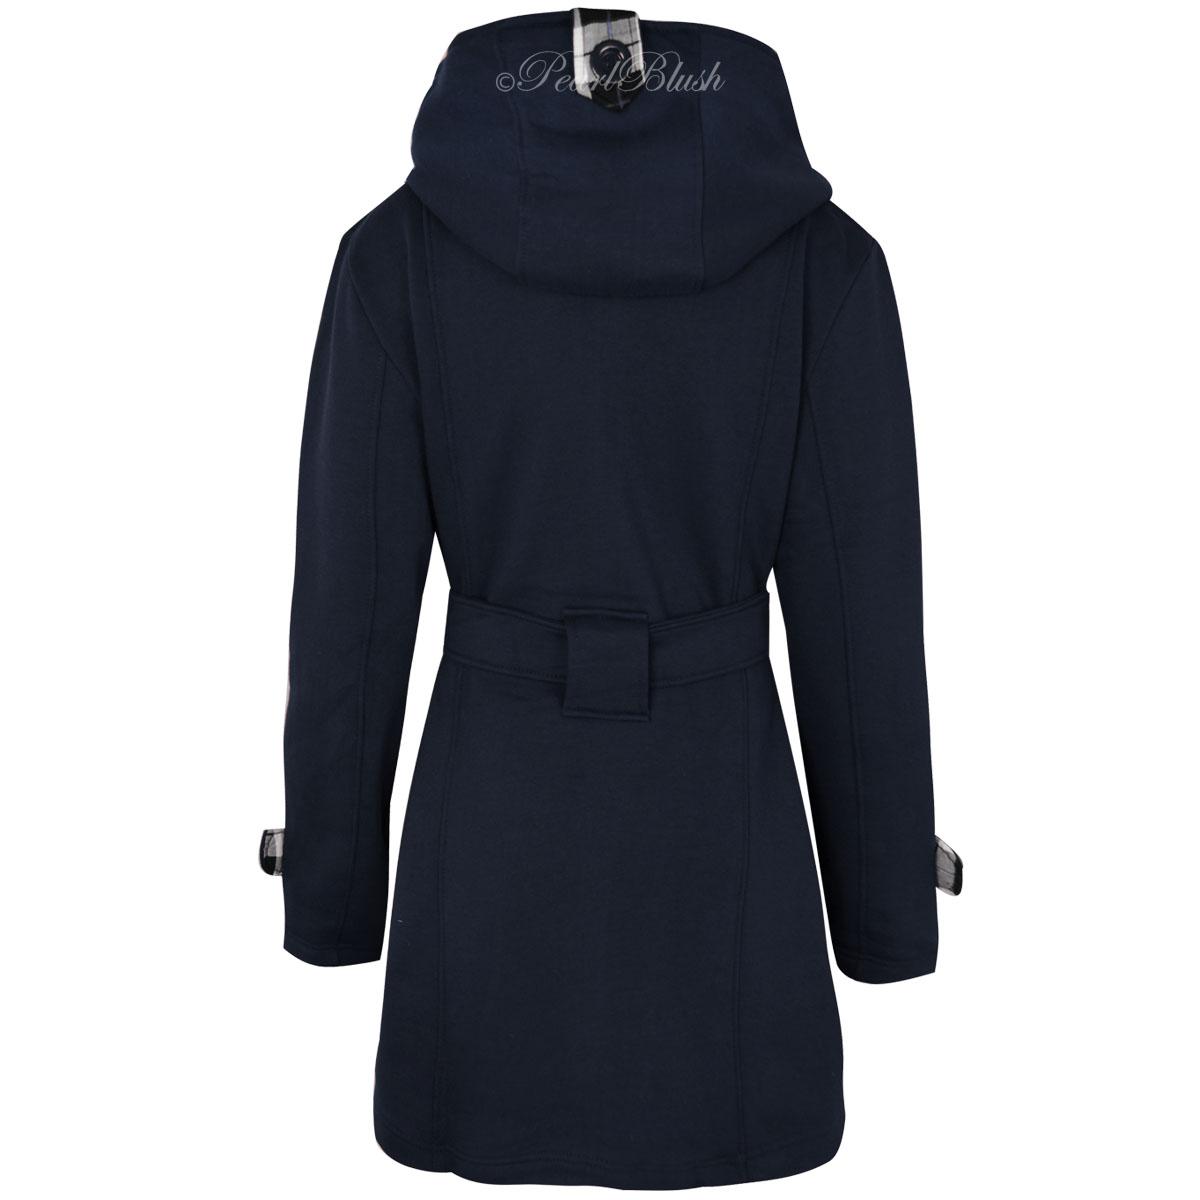 Womens coat with hood